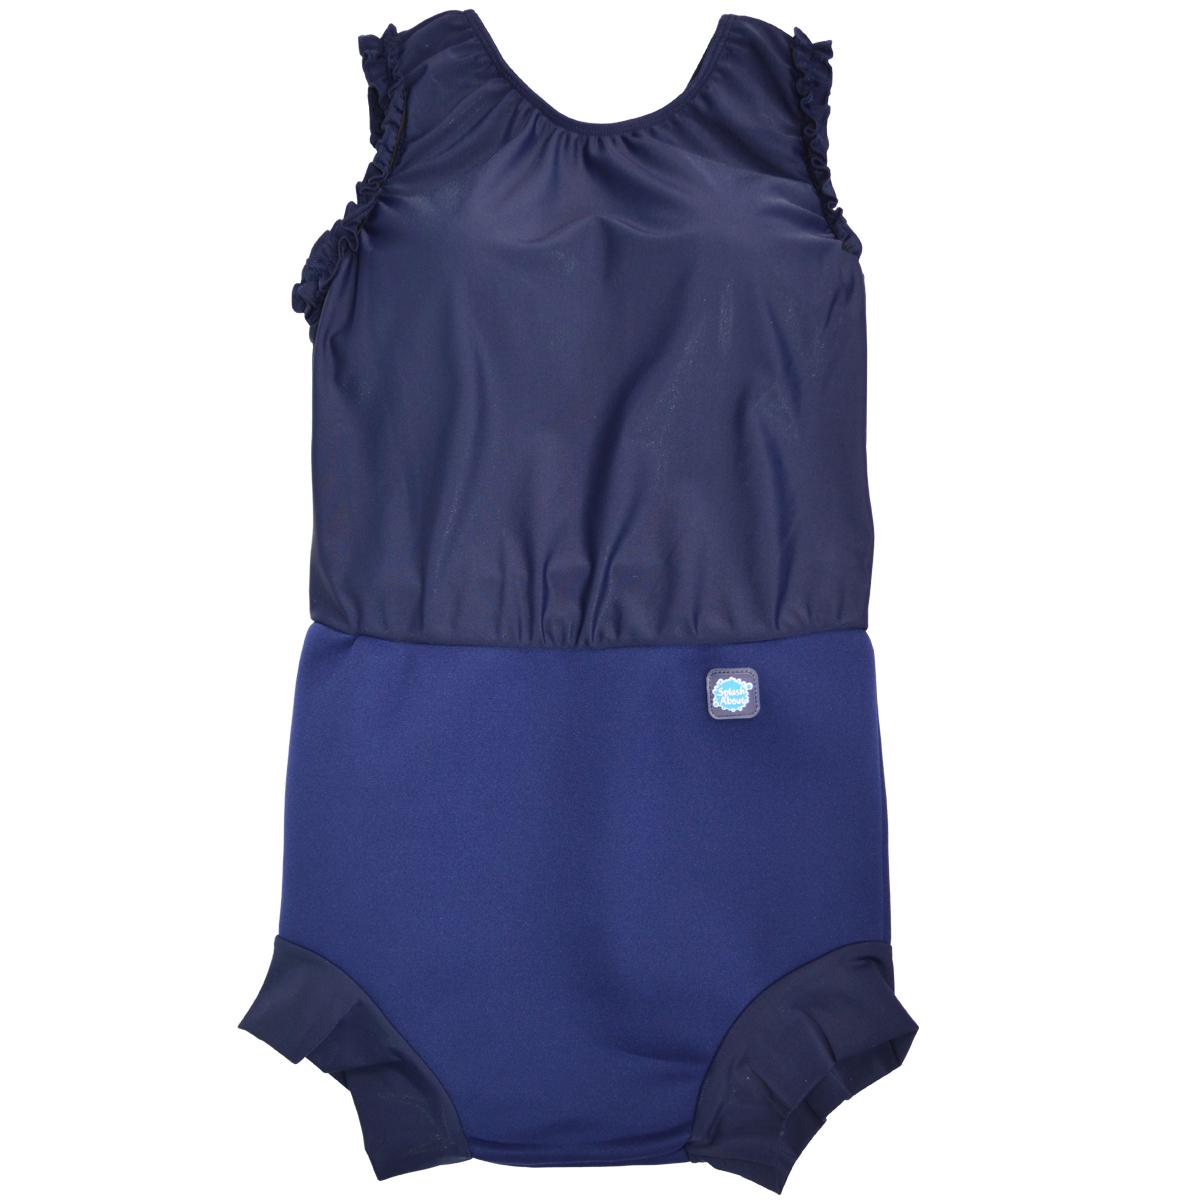 Trunk clipart swimming costume #15